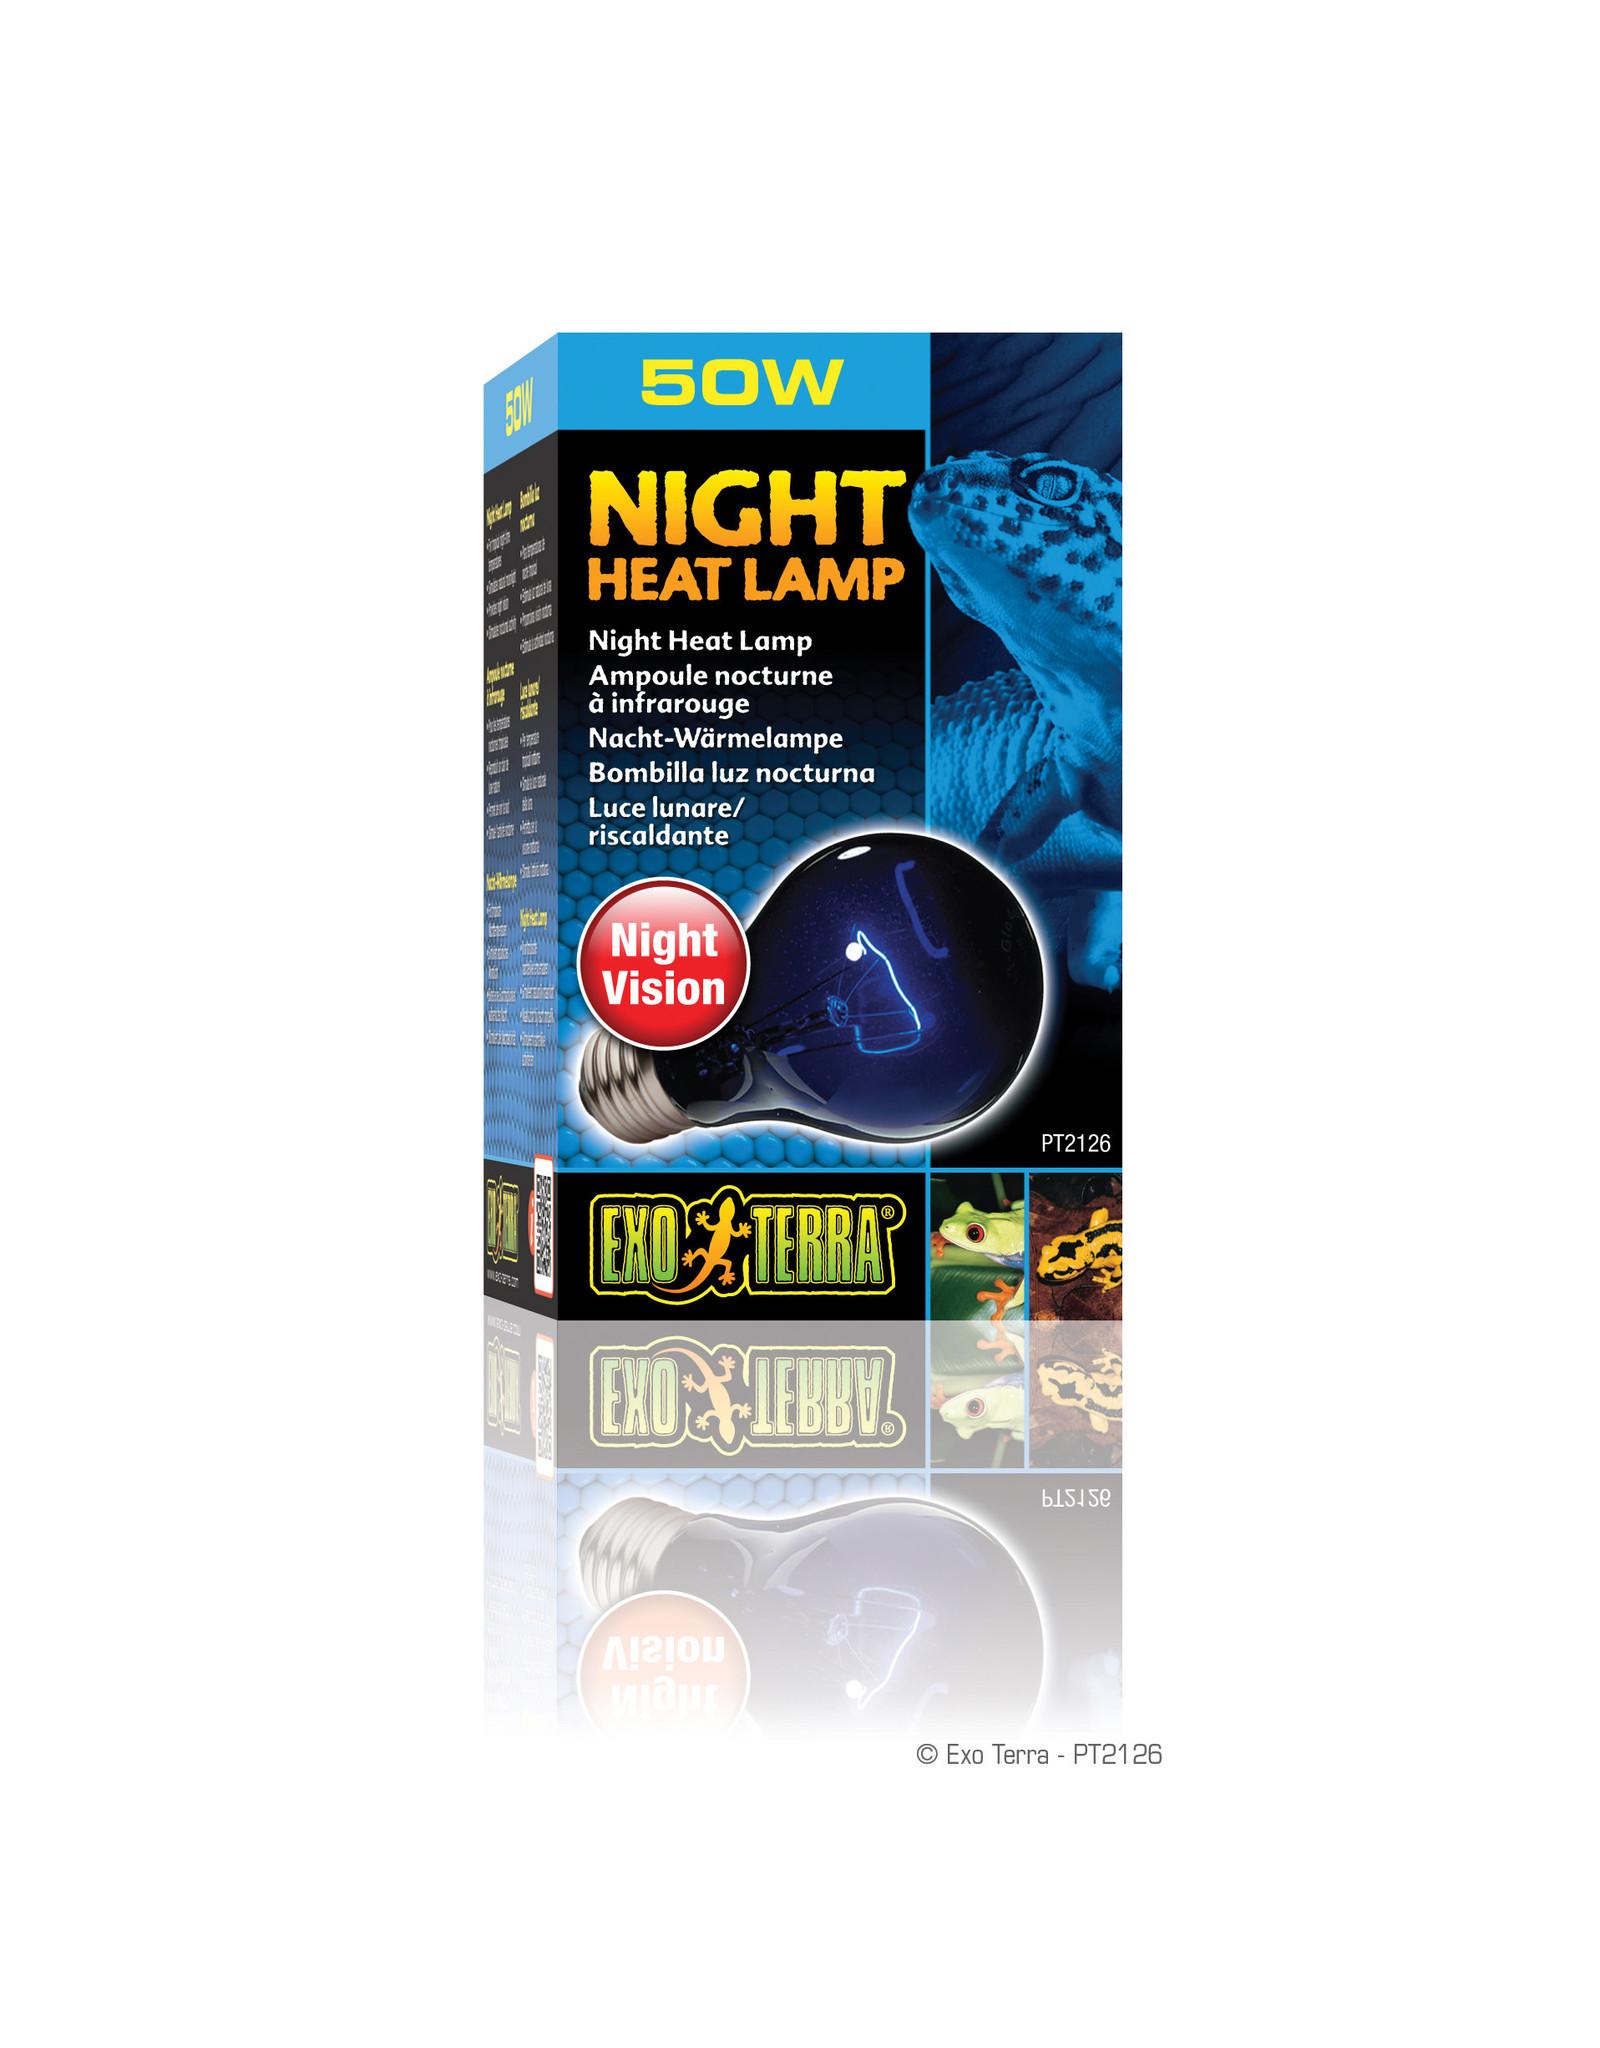 Exo Terra Night Heat Lamp - A19 / 50W